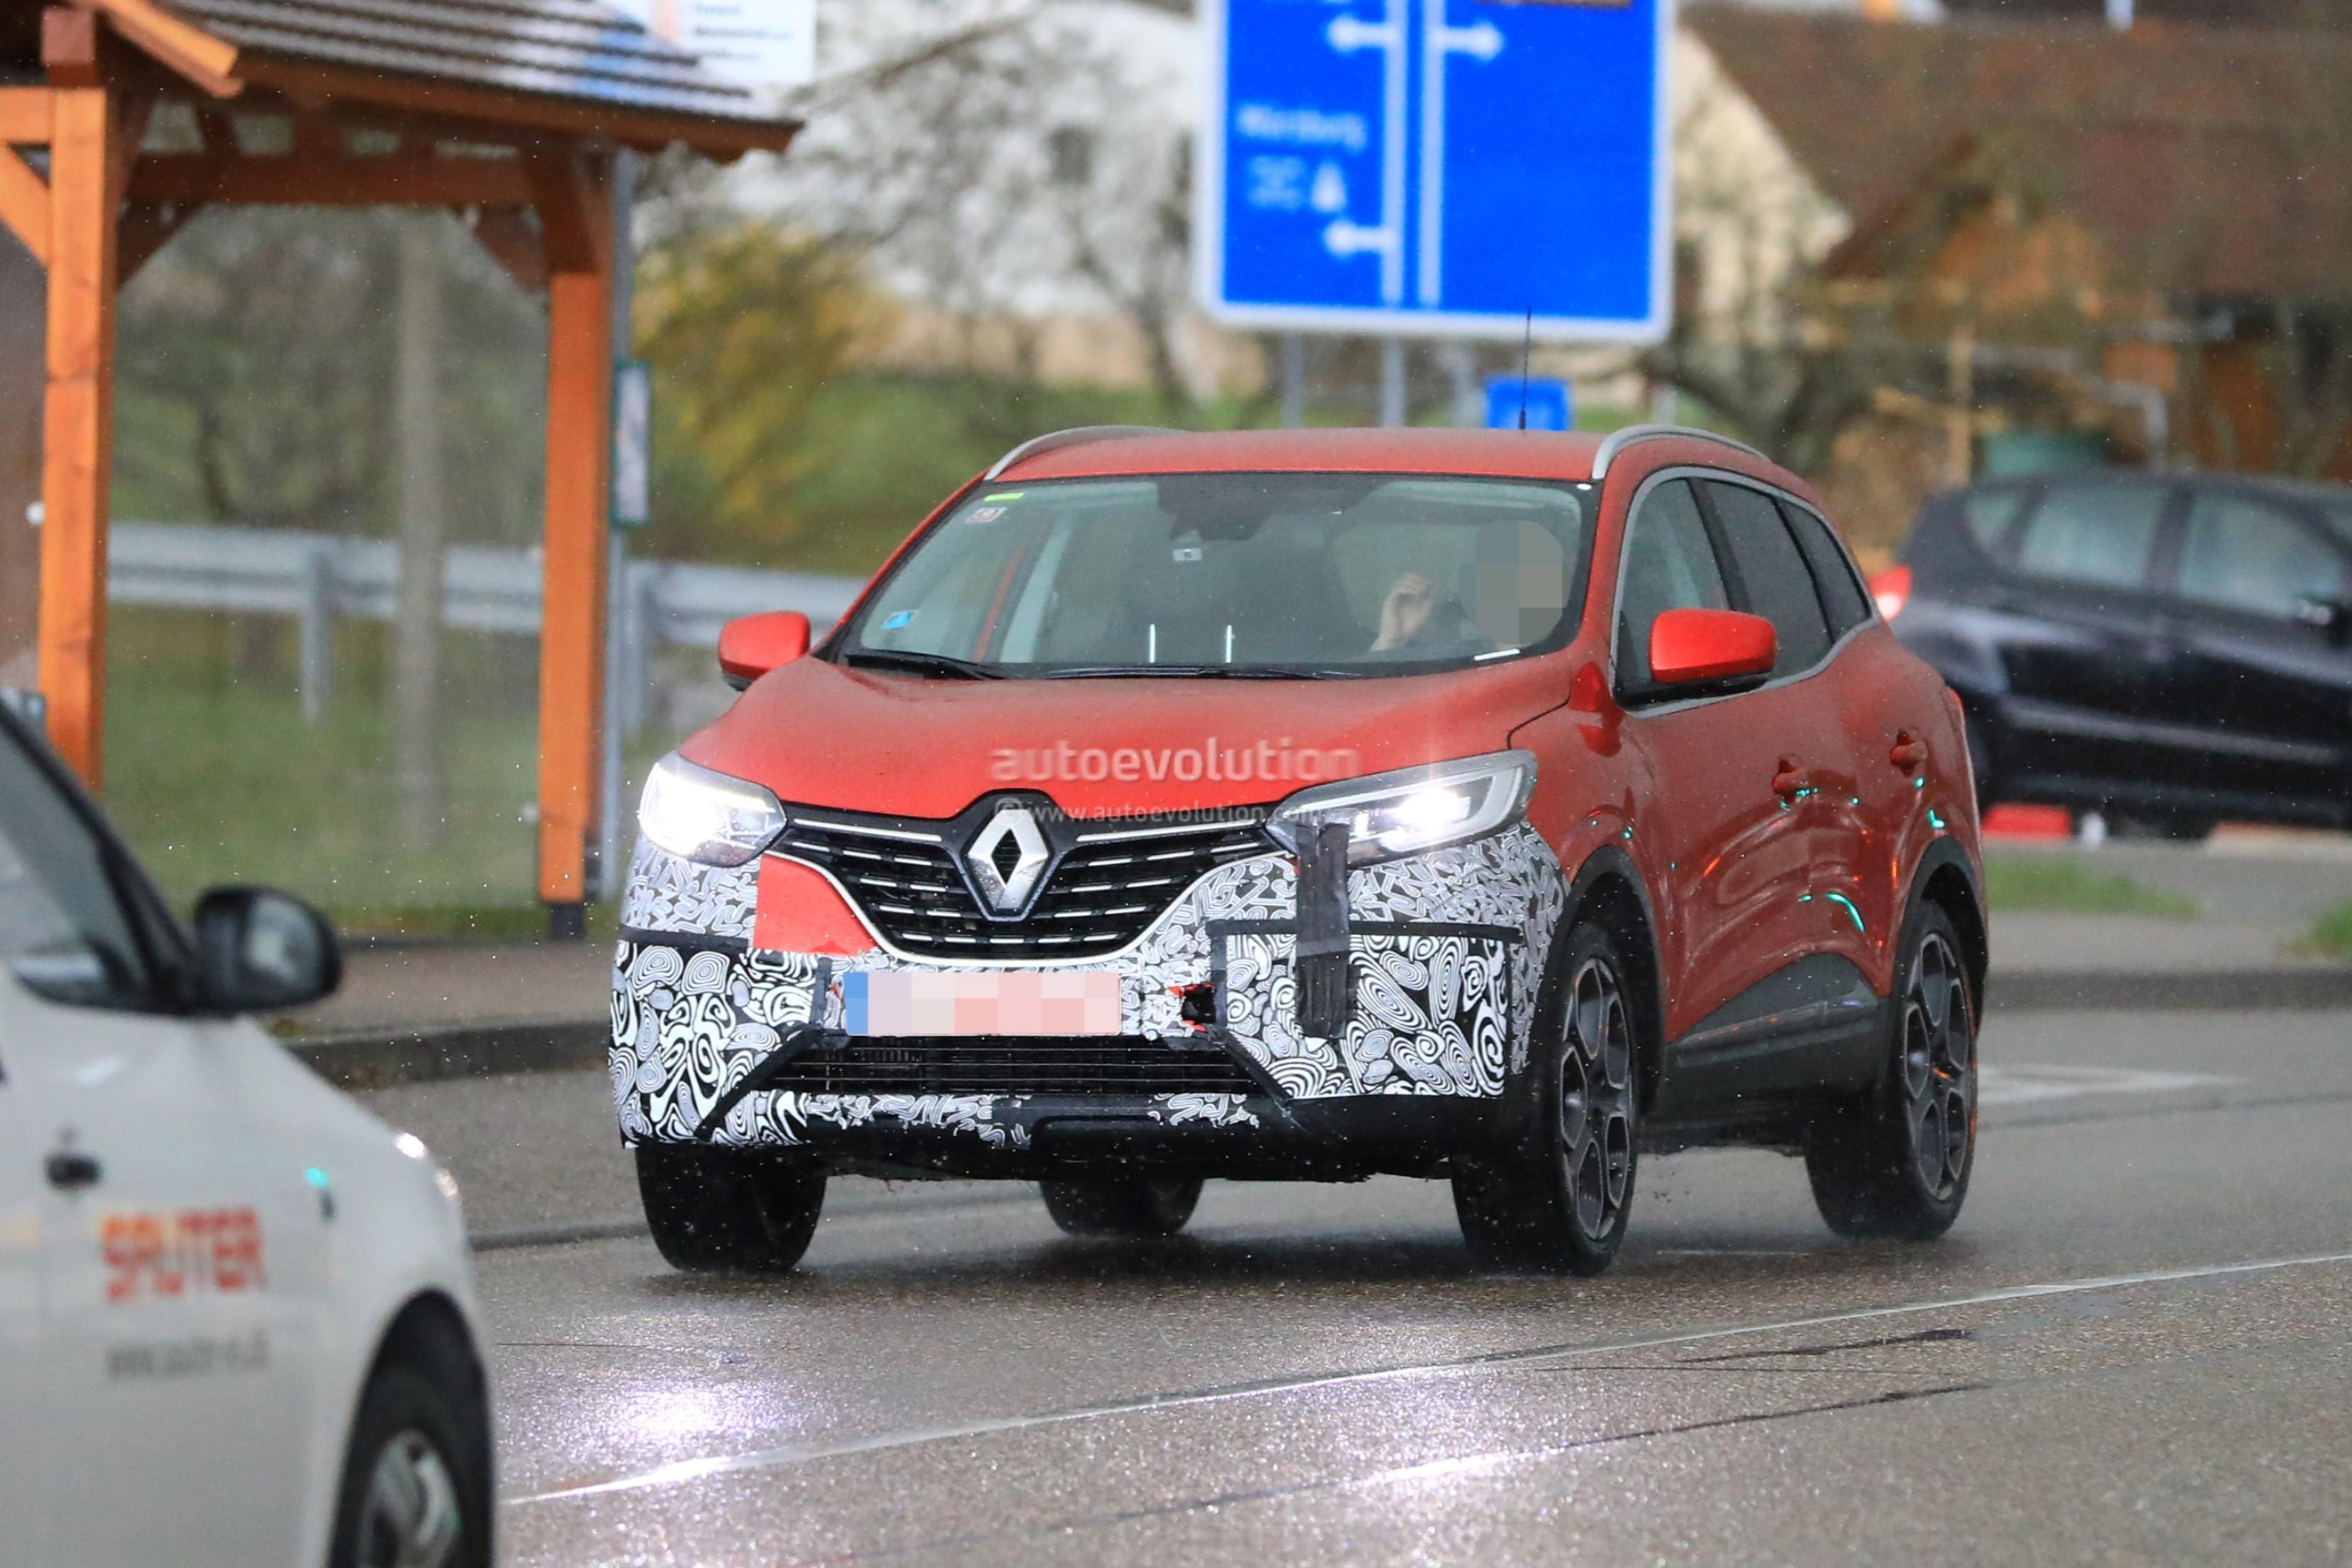 Renault Kadjar Facelift Shows Redesigned Grille In Newest Spy Photos